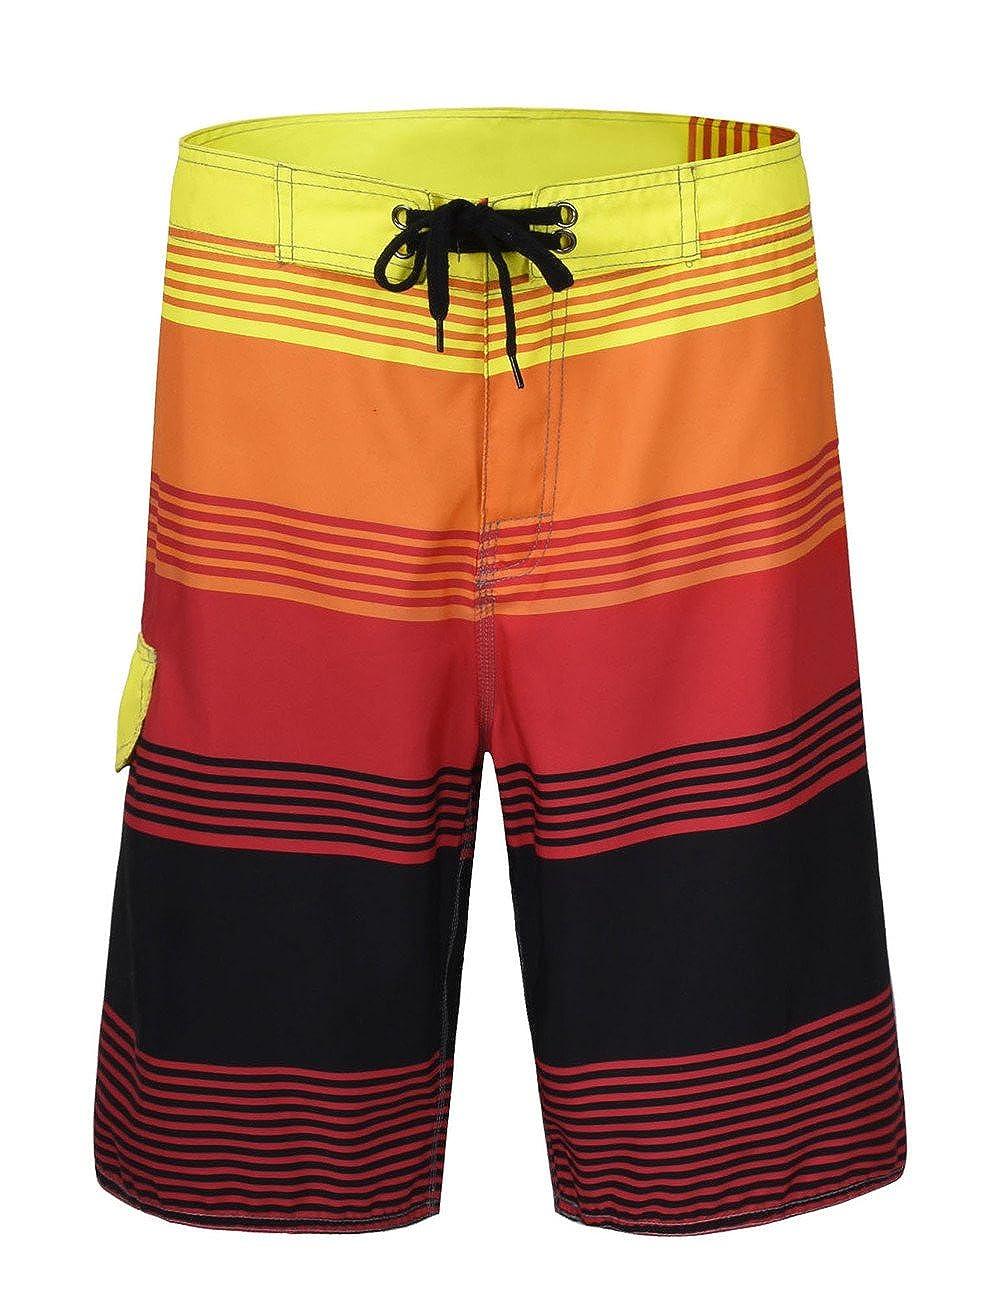 Hopgo Men's Swim Trunks 22' Boardshort Beach Shorts Swimwear Shorts HP-MK03300